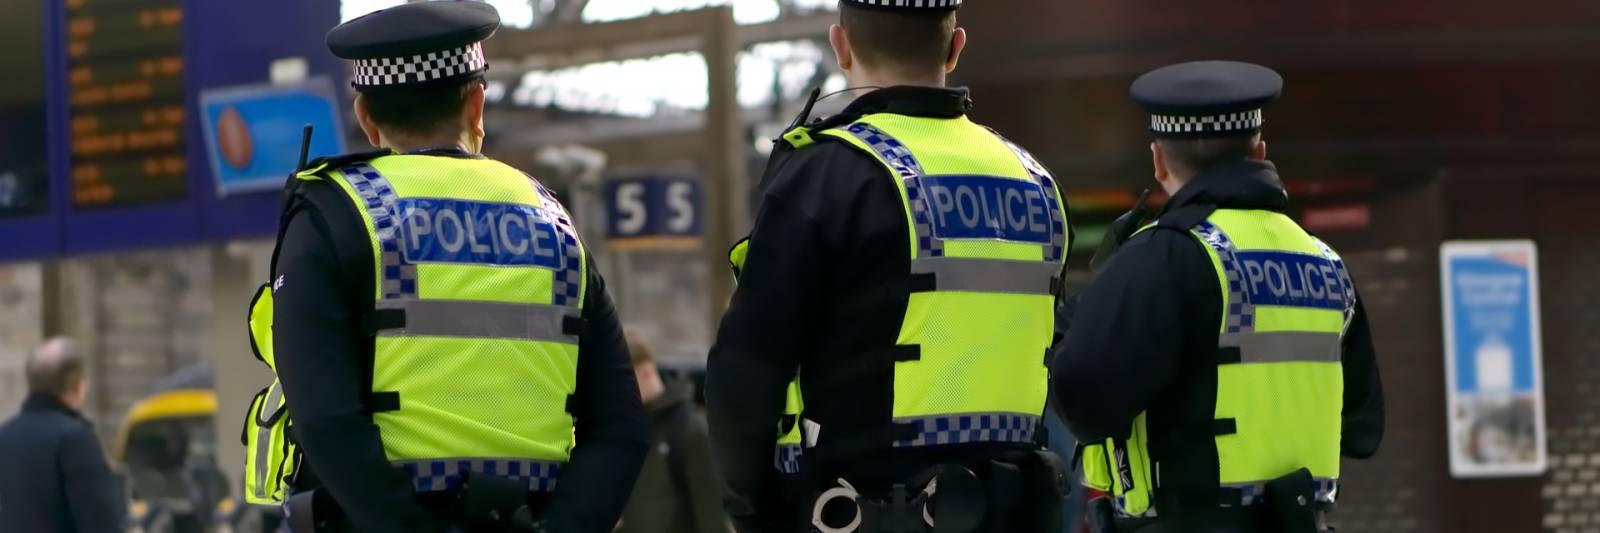 capgemini wins £600 million contract with met police